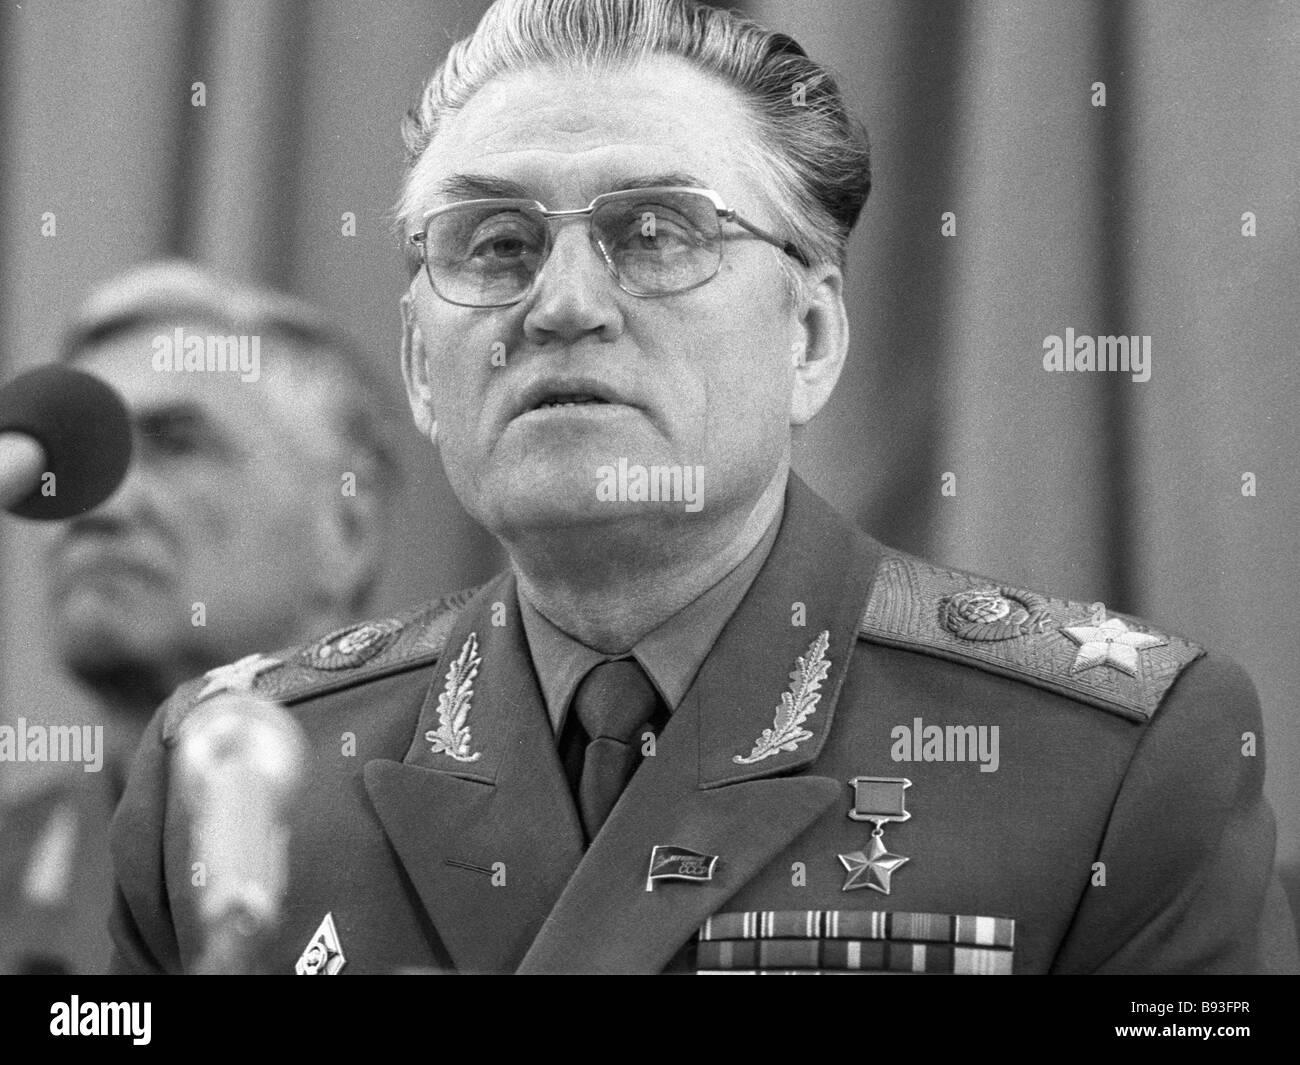 Marshal Shaposhnikov Boris Mikhailovich: biography, awards and interesting facts 56